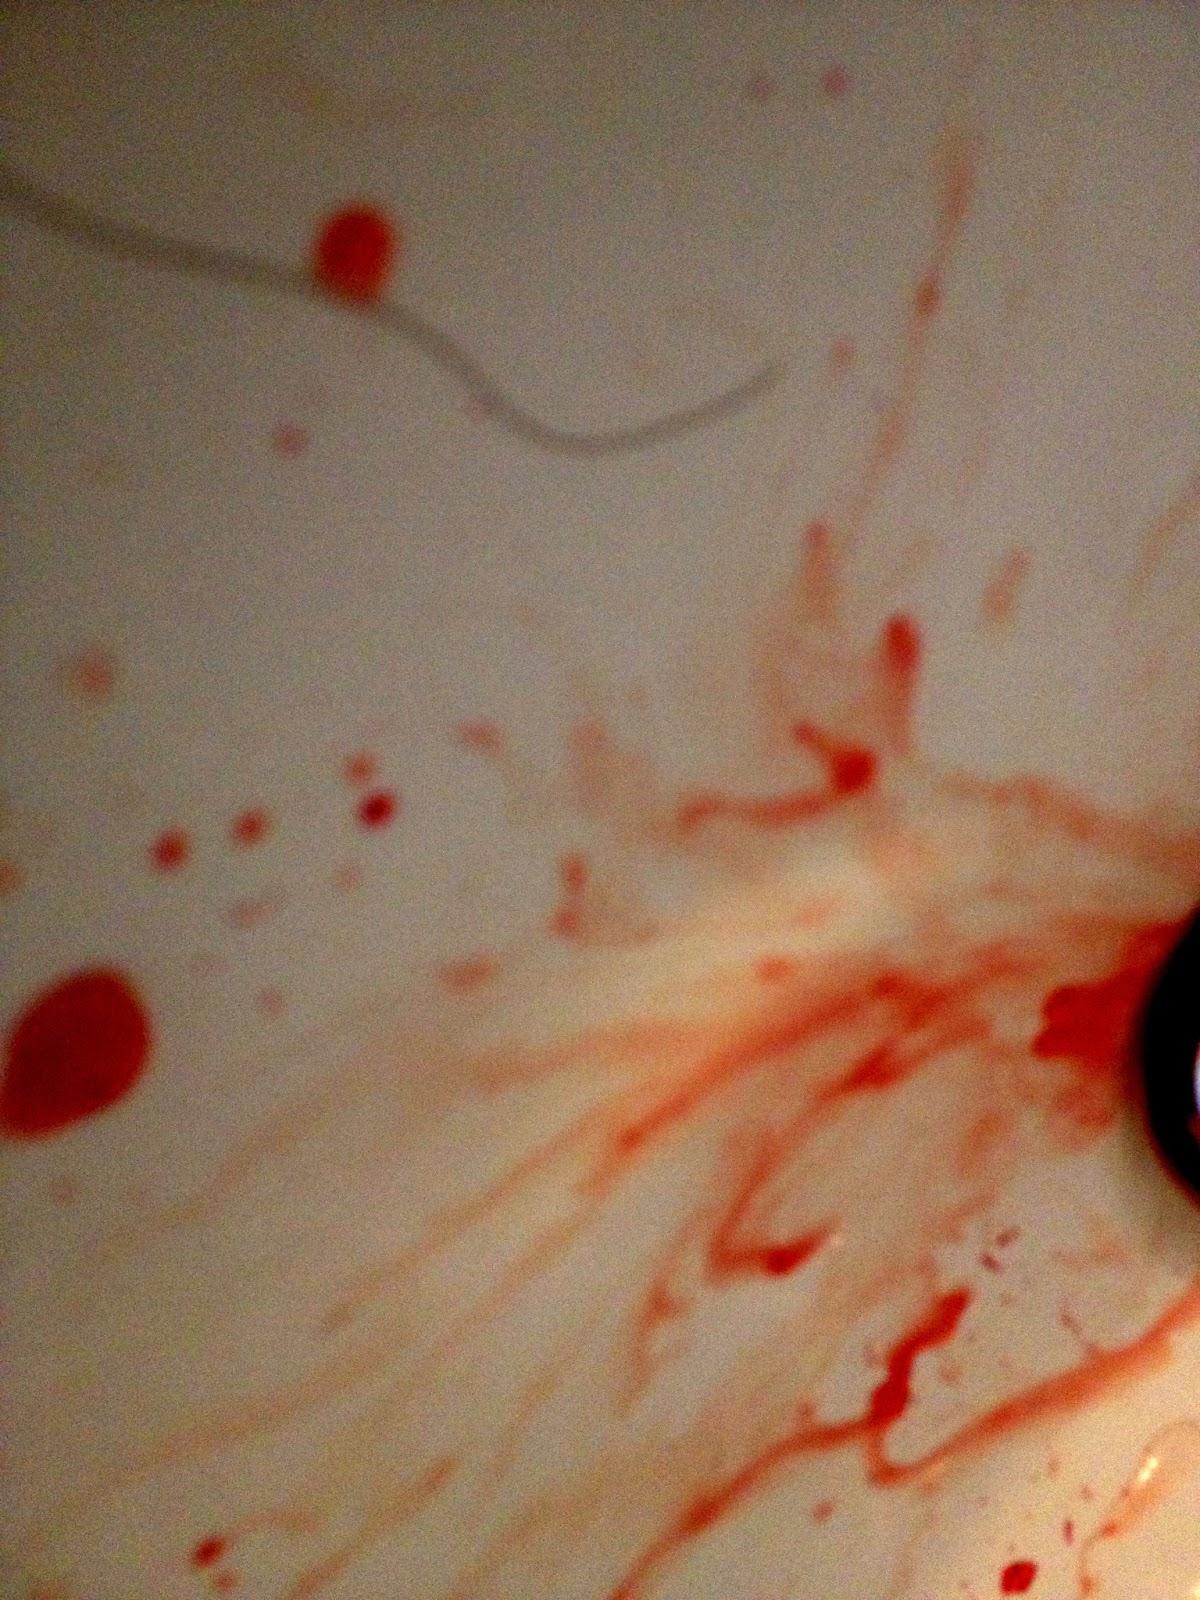 blod från näsan